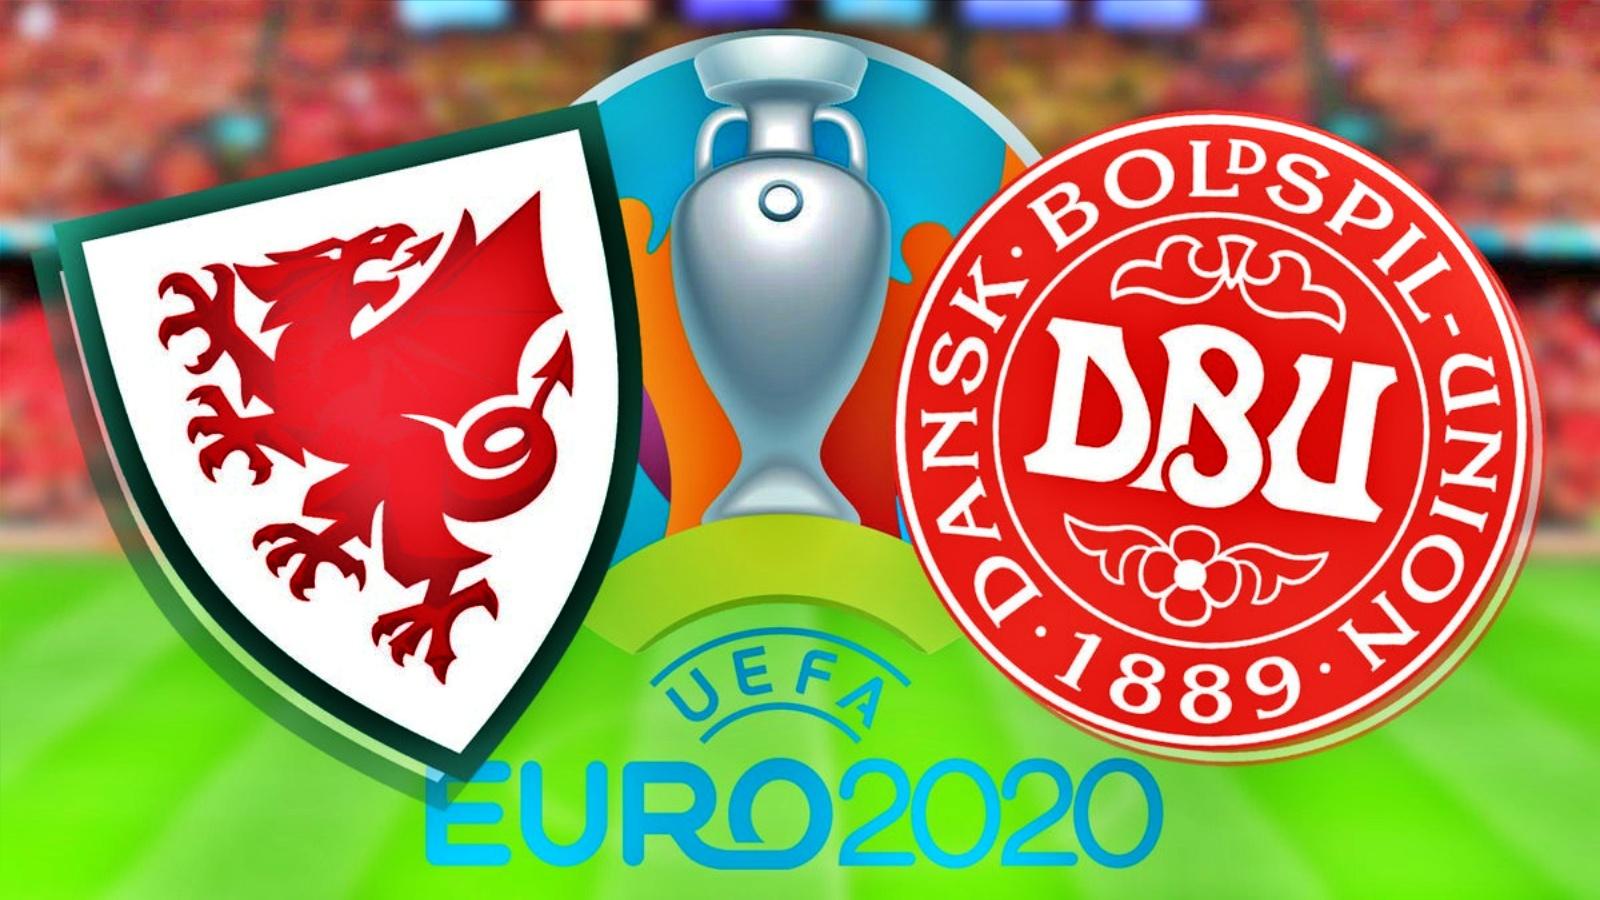 TARA GALILOR - DANEMARCA LIVE PRO TV EURO 2020